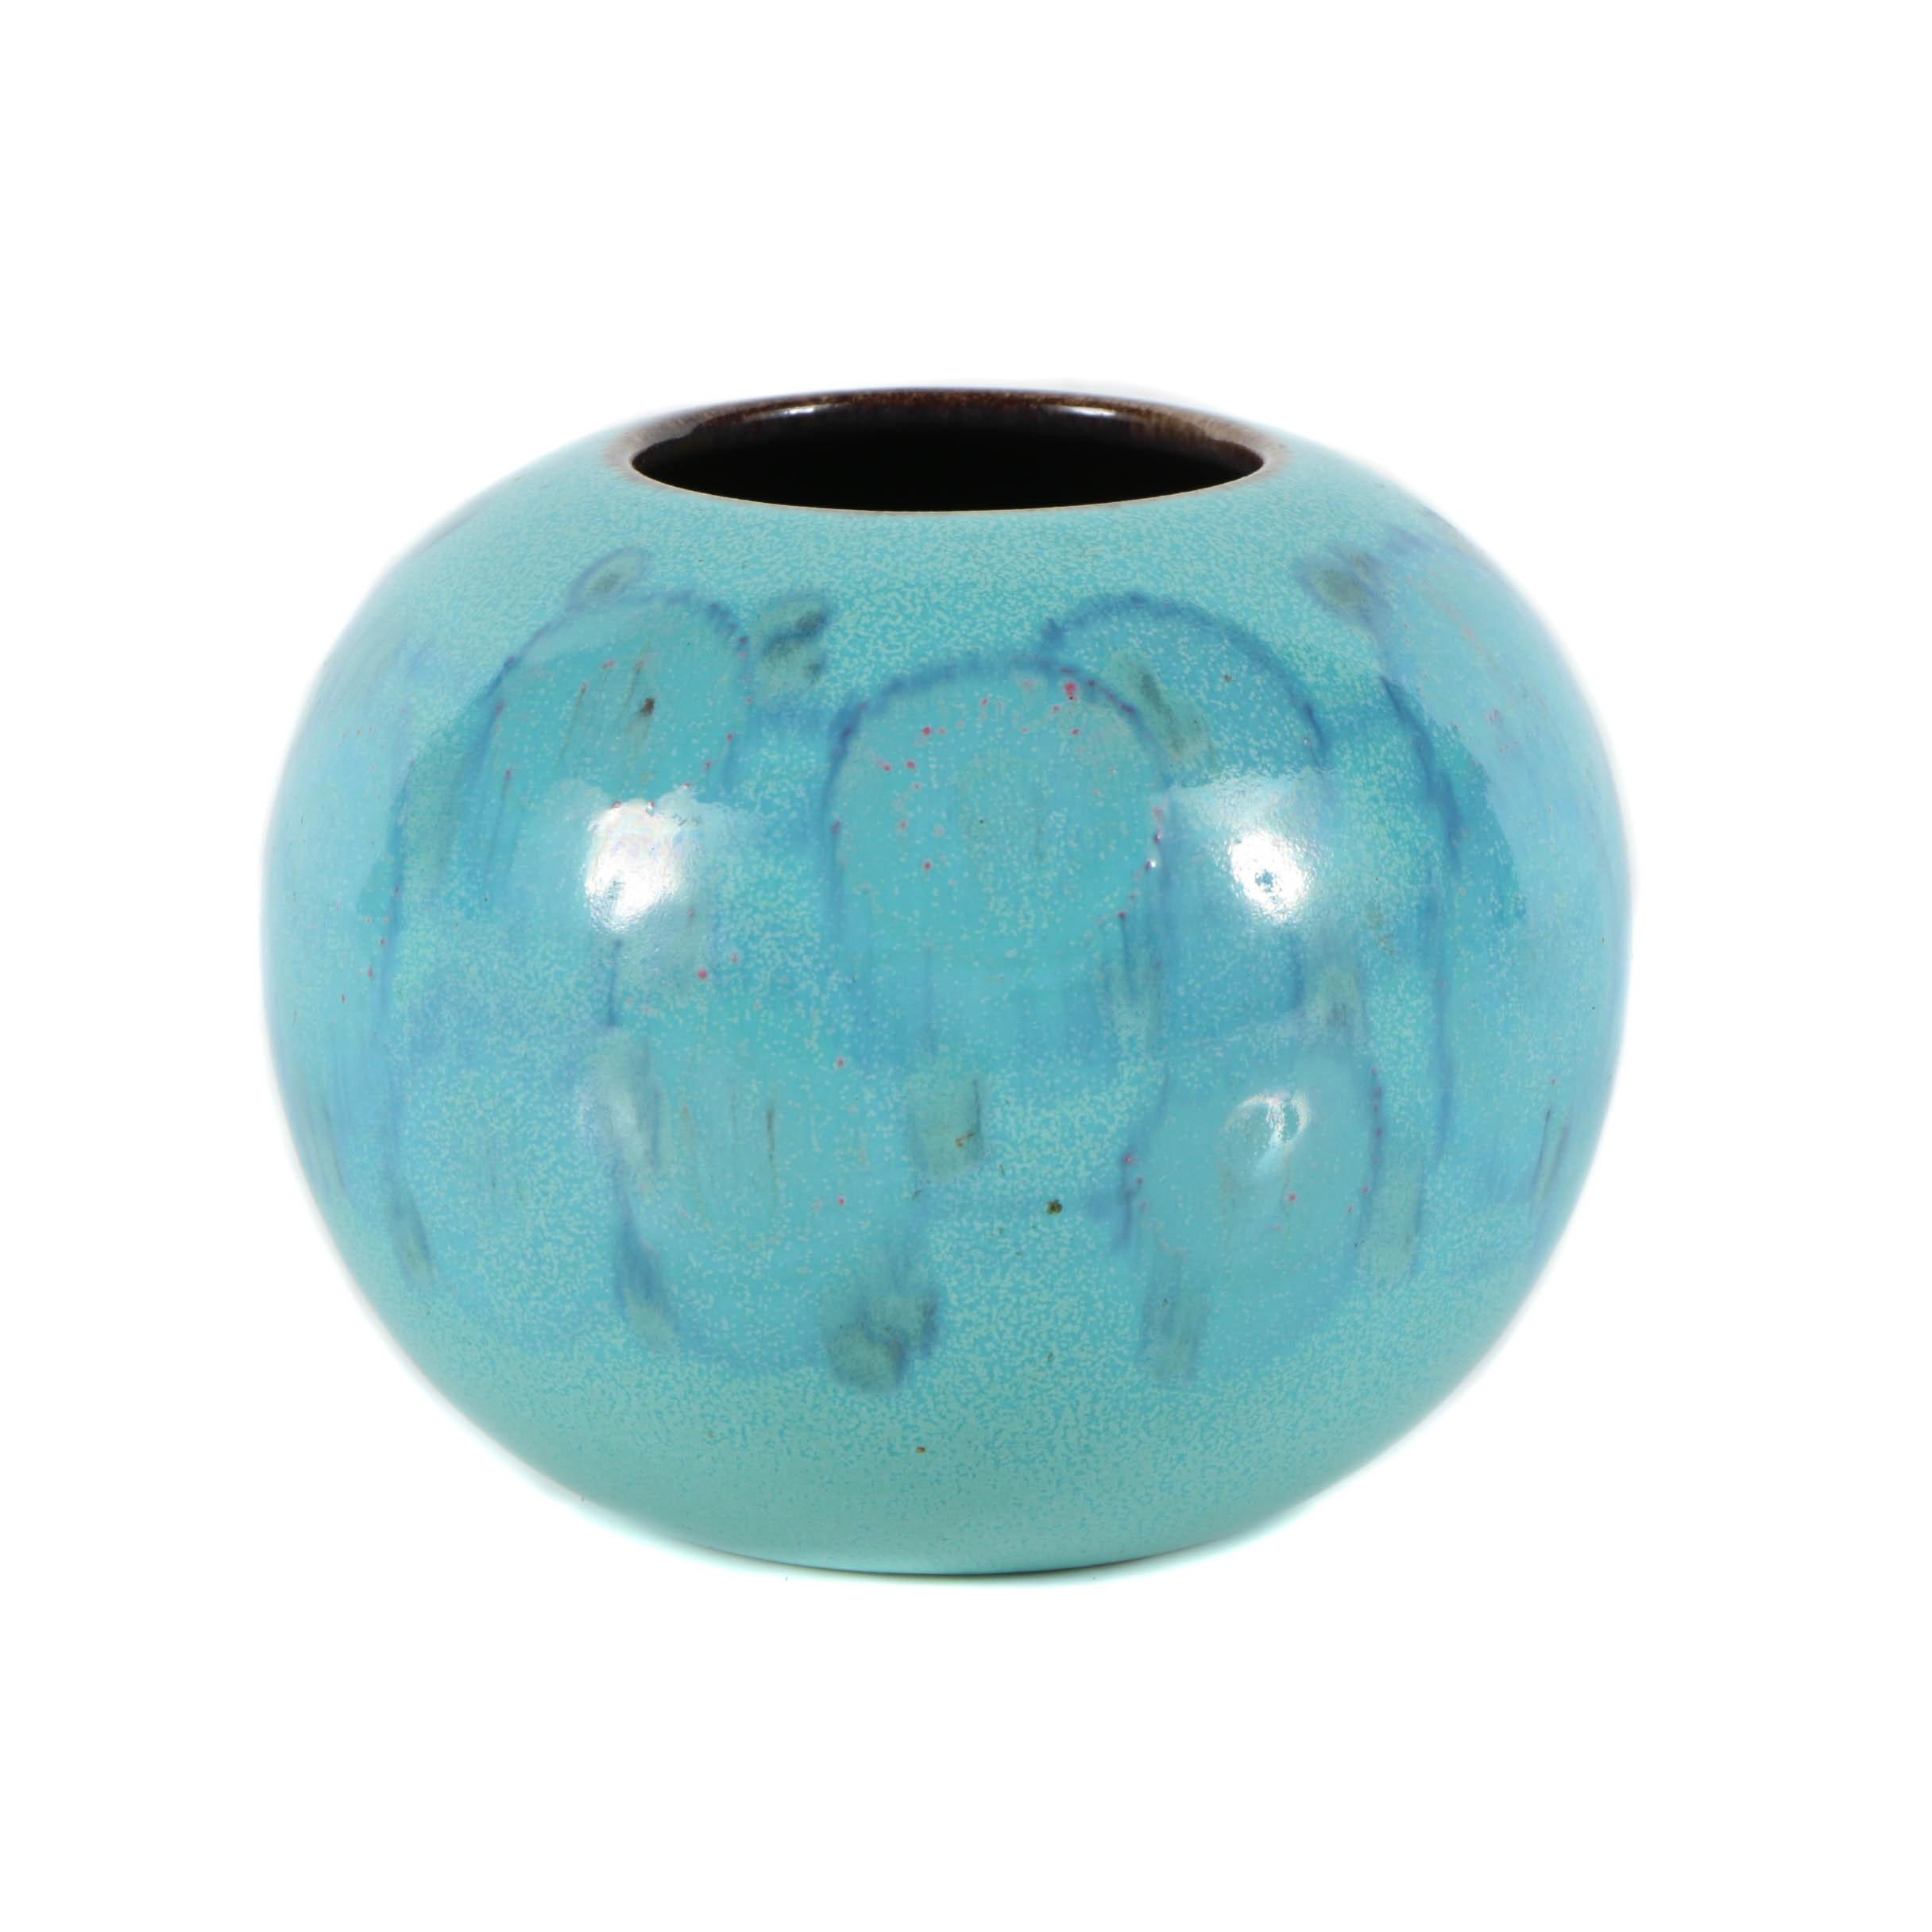 1931 Sara Sax Rookwood Pottery Vase